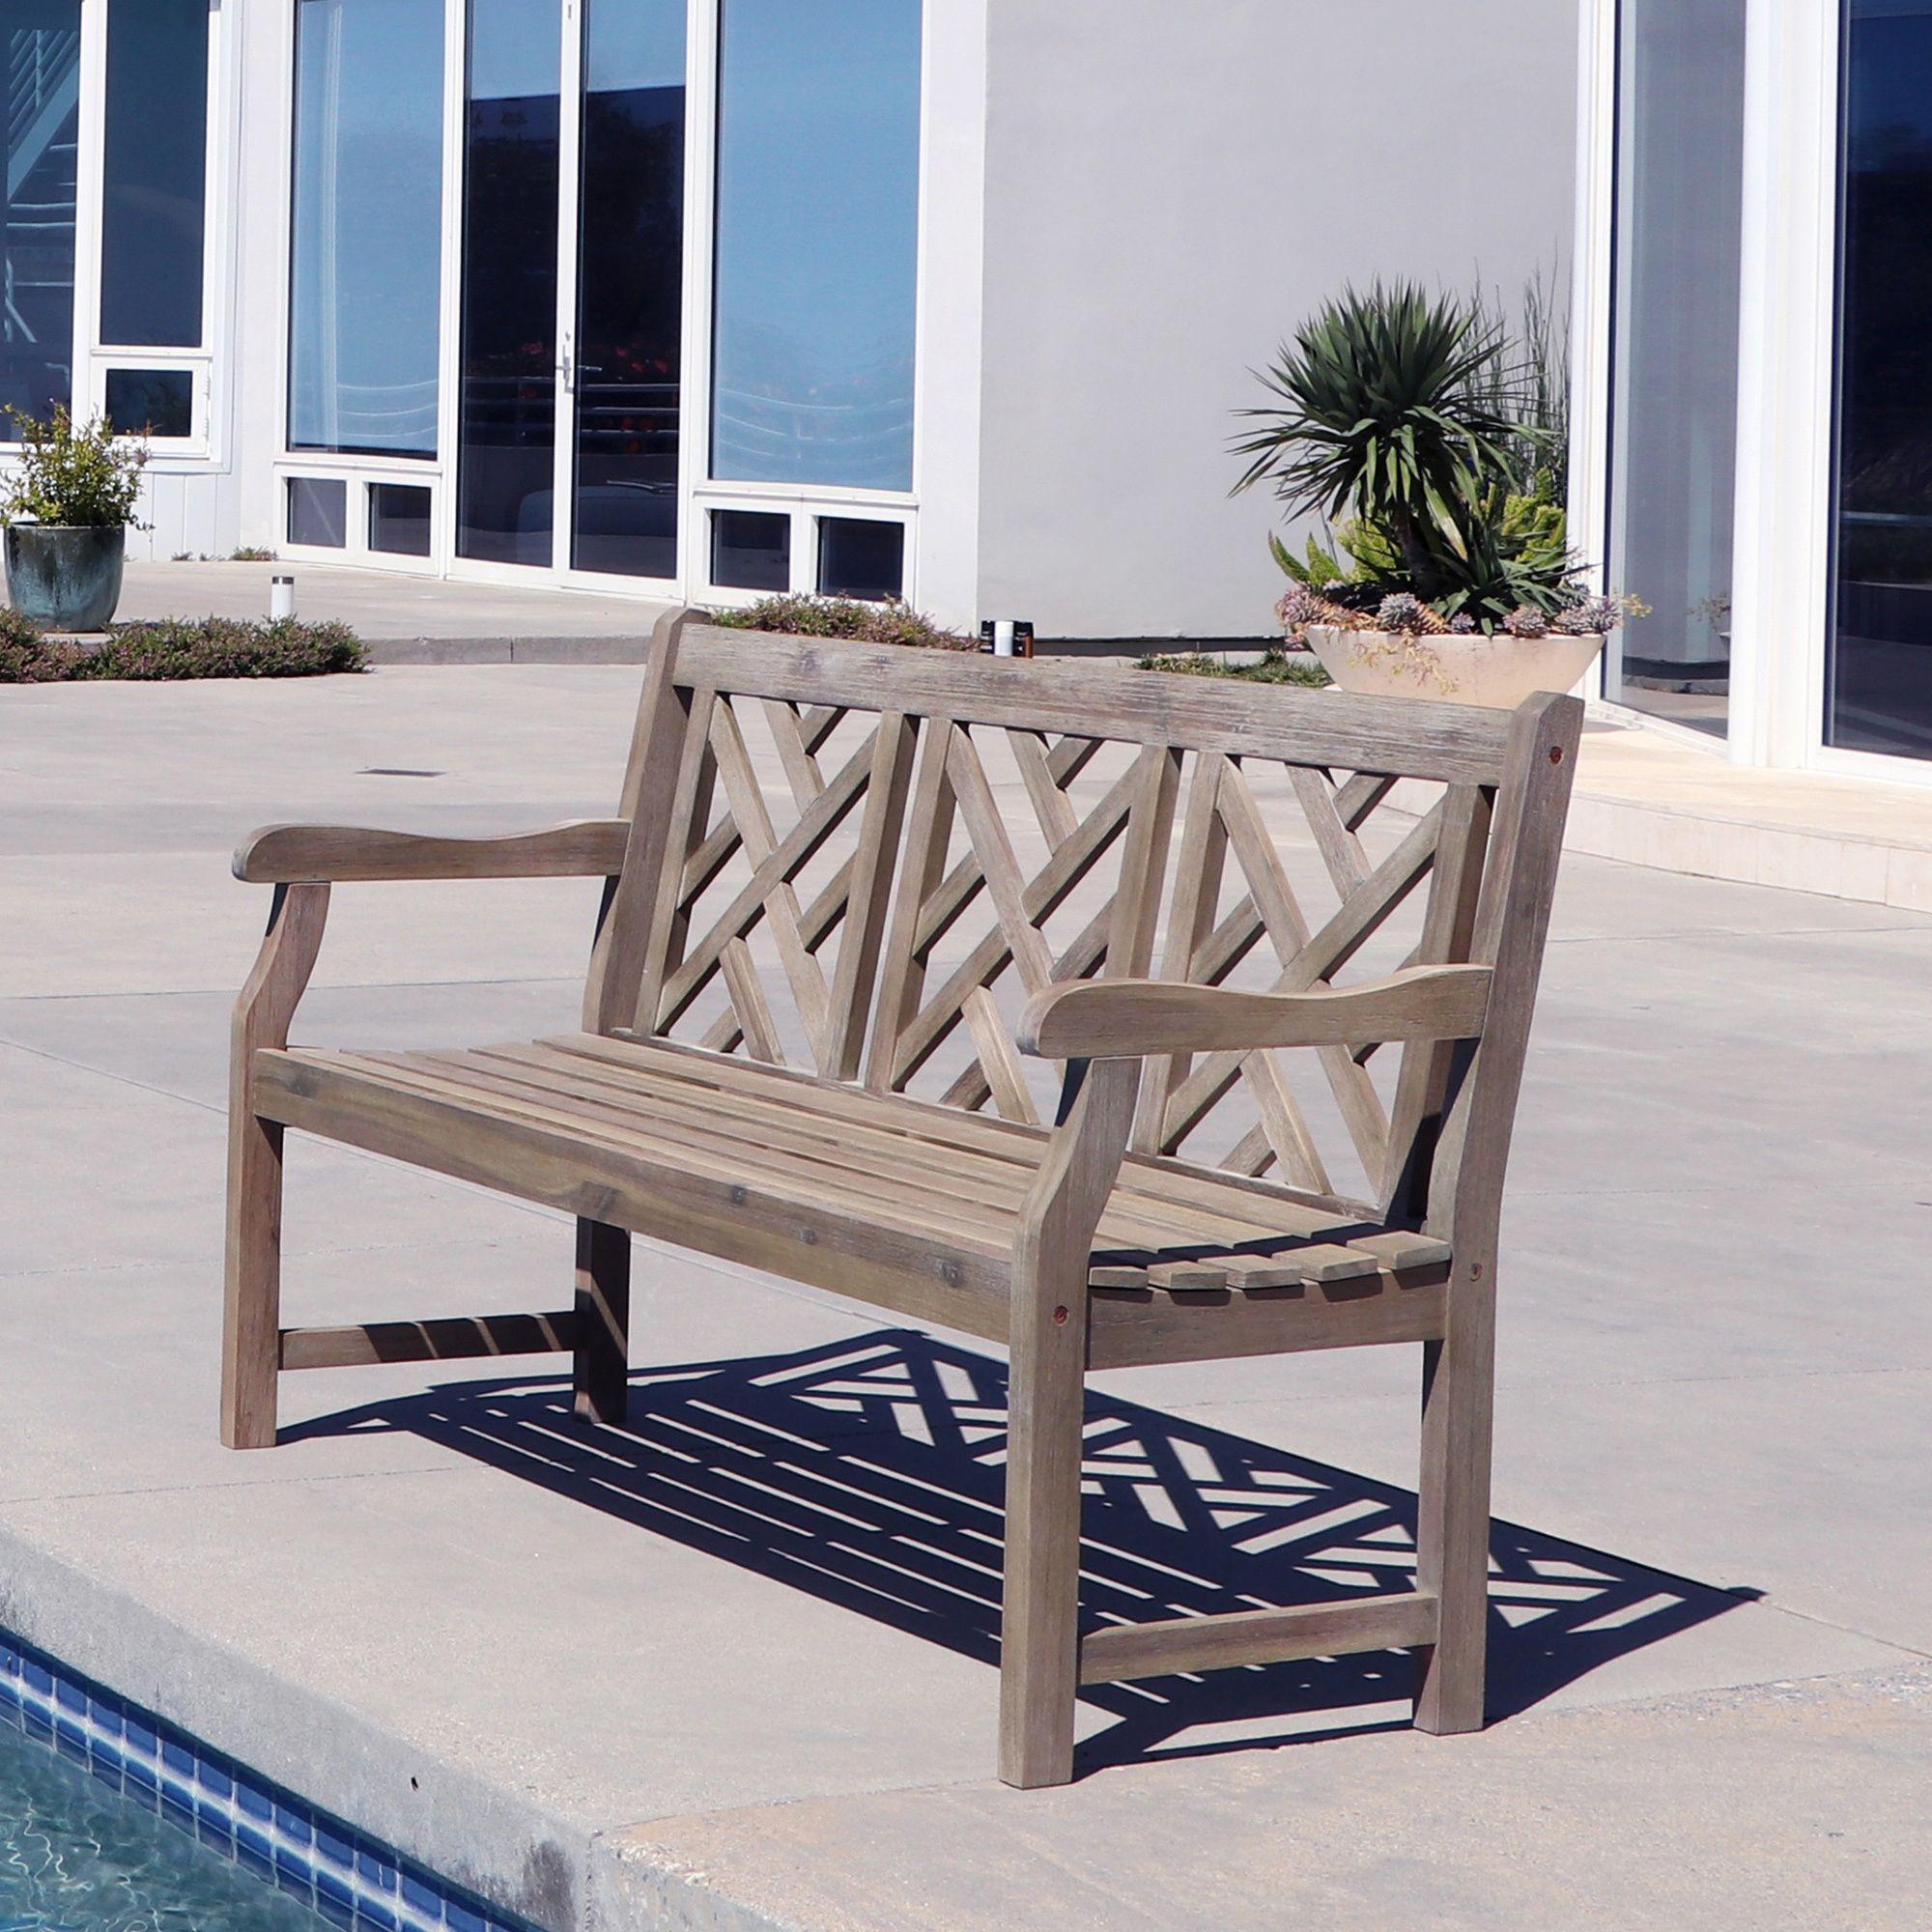 Vifah Patio Furniture.Vifah Comfortable Renaissance Outdoor Hand Scraped Hardwood Bench